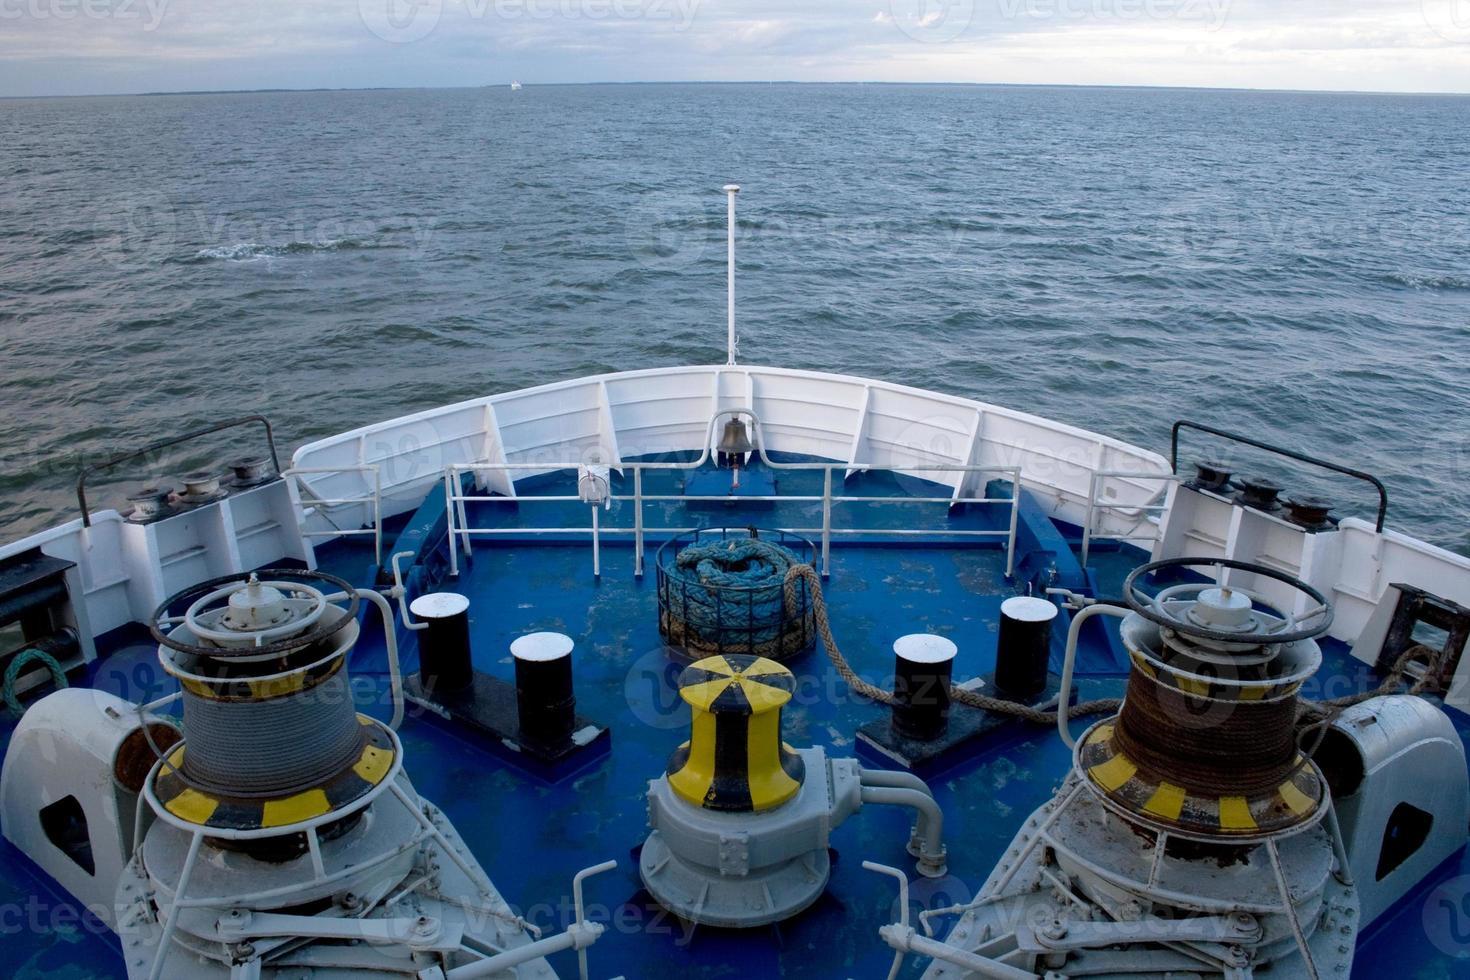 vista do navio foto